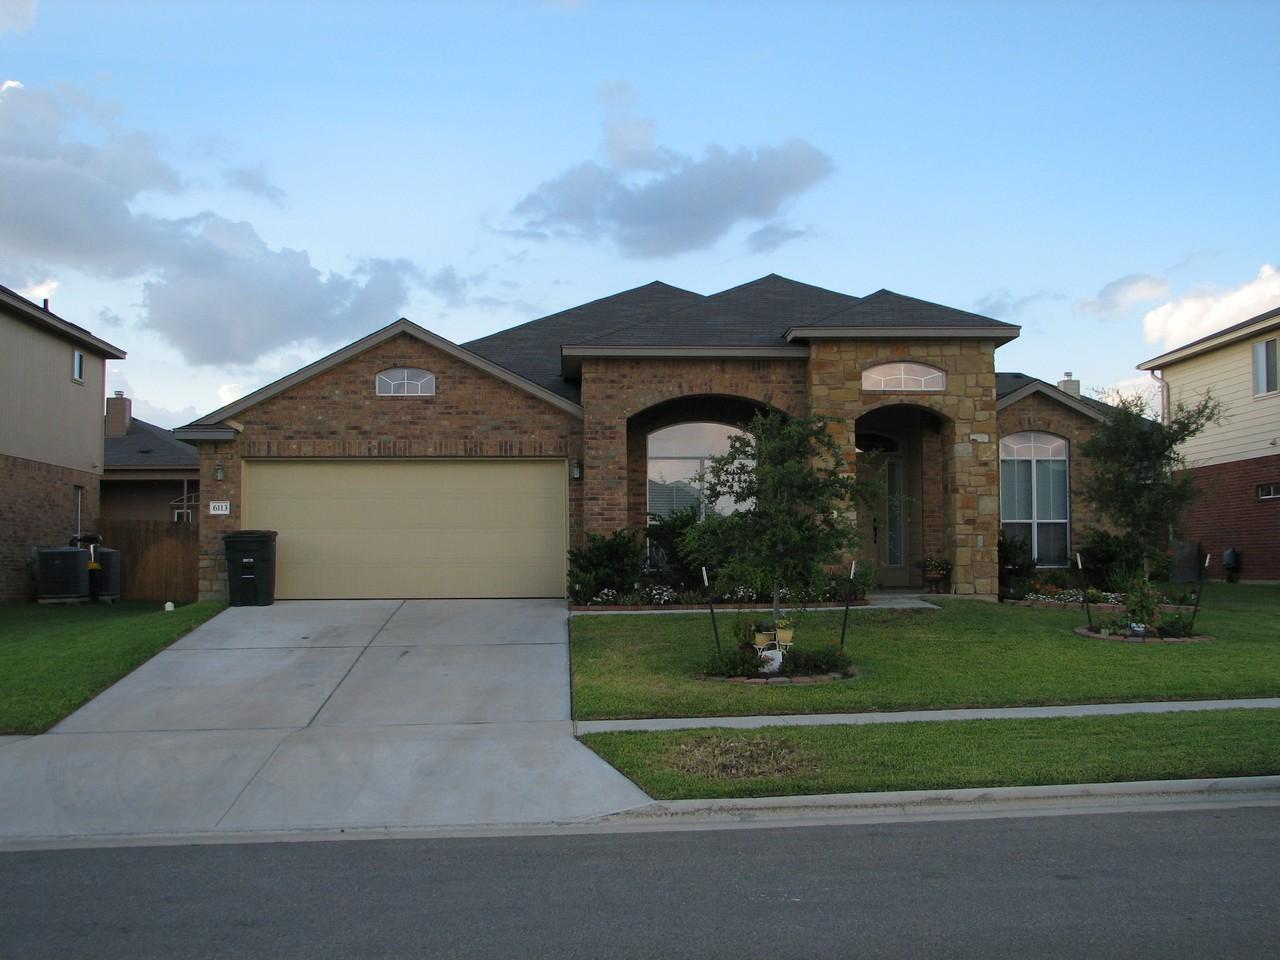 6113 Charlotte Ln   Apartment for Rent  Killeen Apartments. 6113 Charlotte Ln  Killeen  TX 76542   3 Bedroom Apartment for